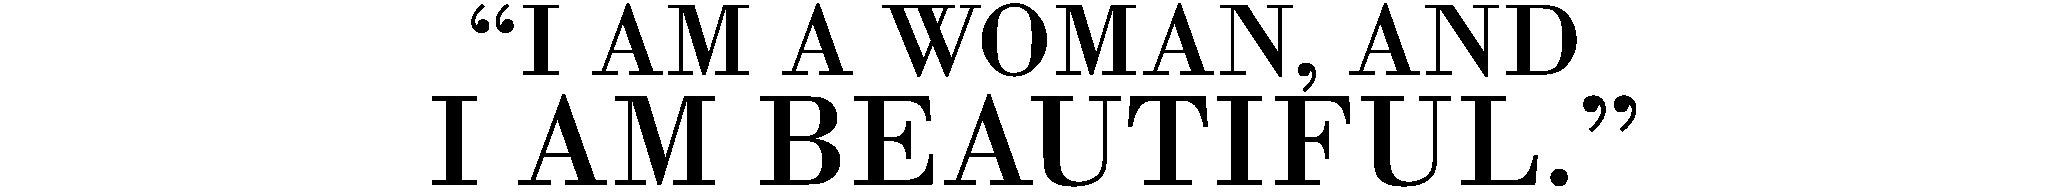 I am a woman, and I am beautiful.